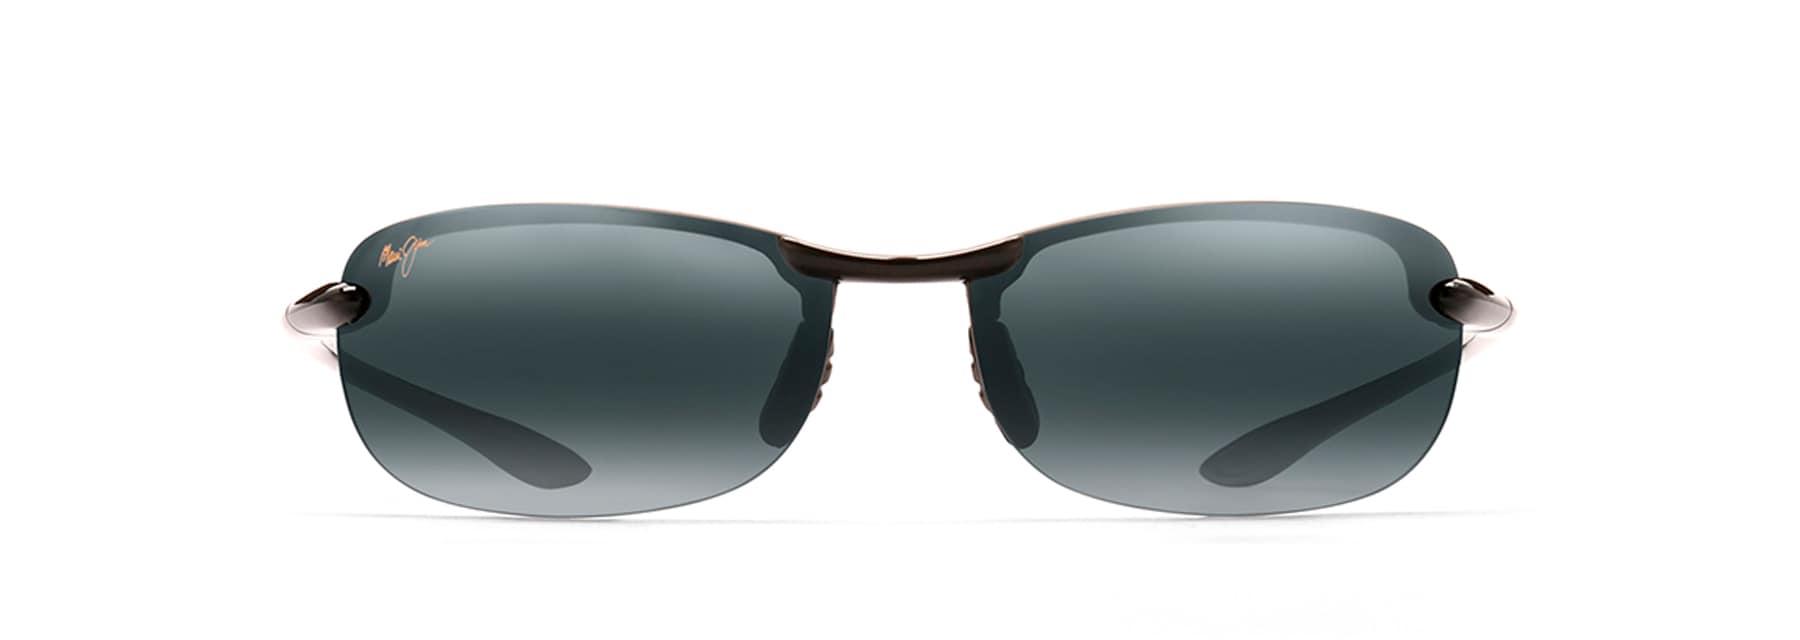 c0efbaa3bef65 Makaha lunettes de soleil polarisées